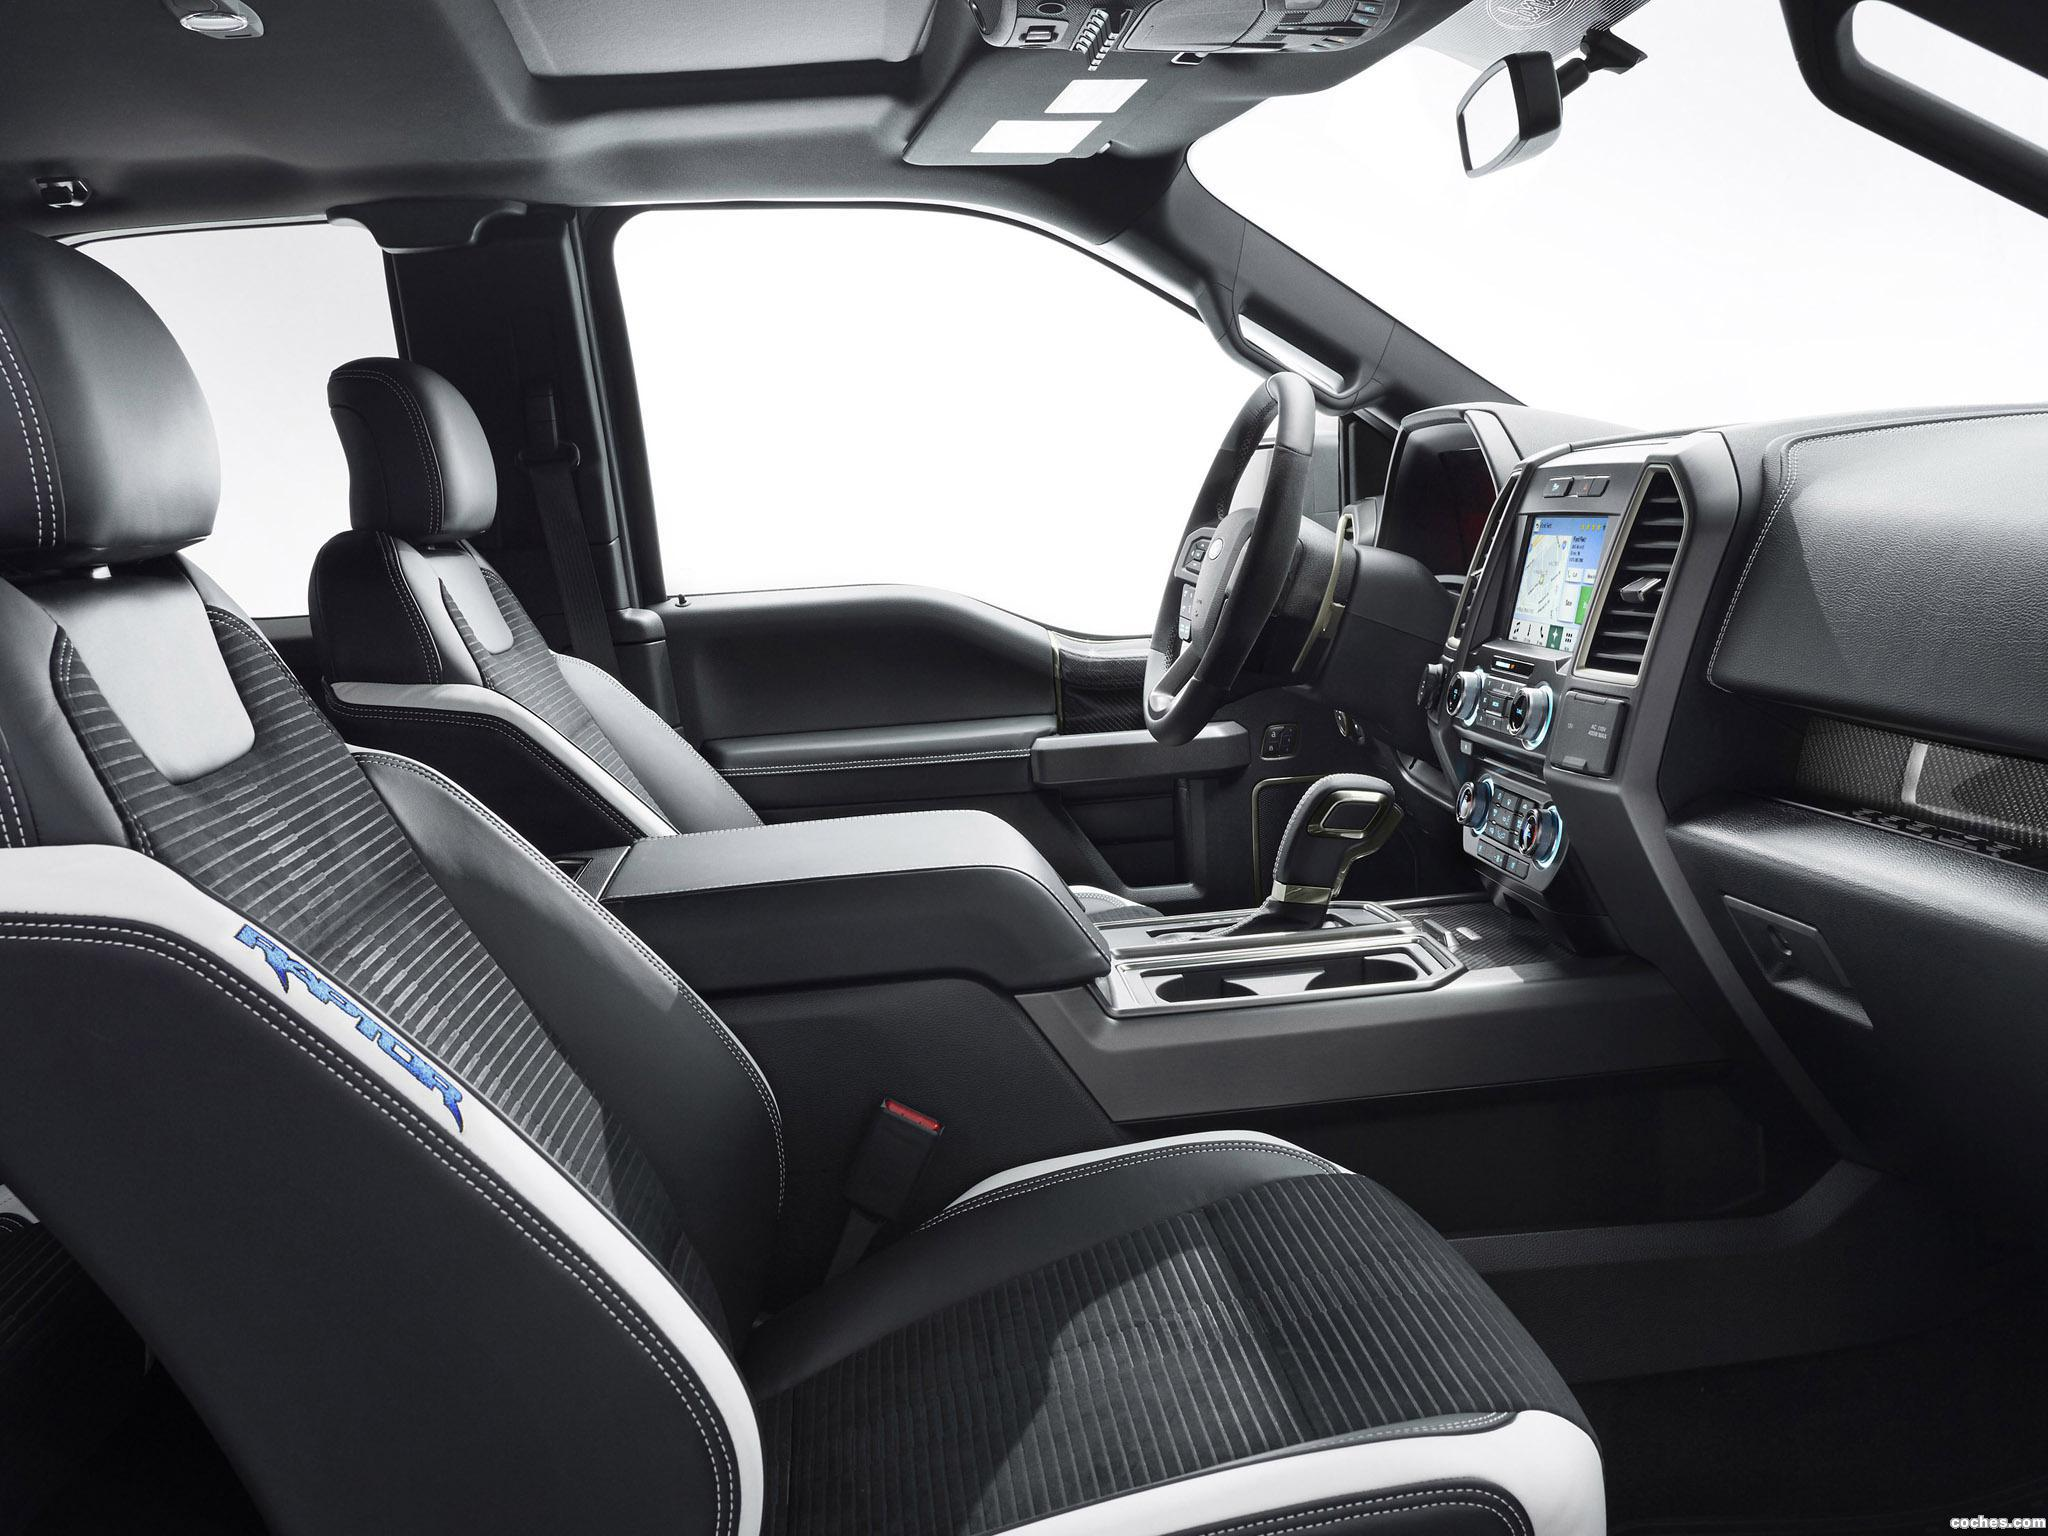 Foto 11 de Ford F-150 Raptor 2015